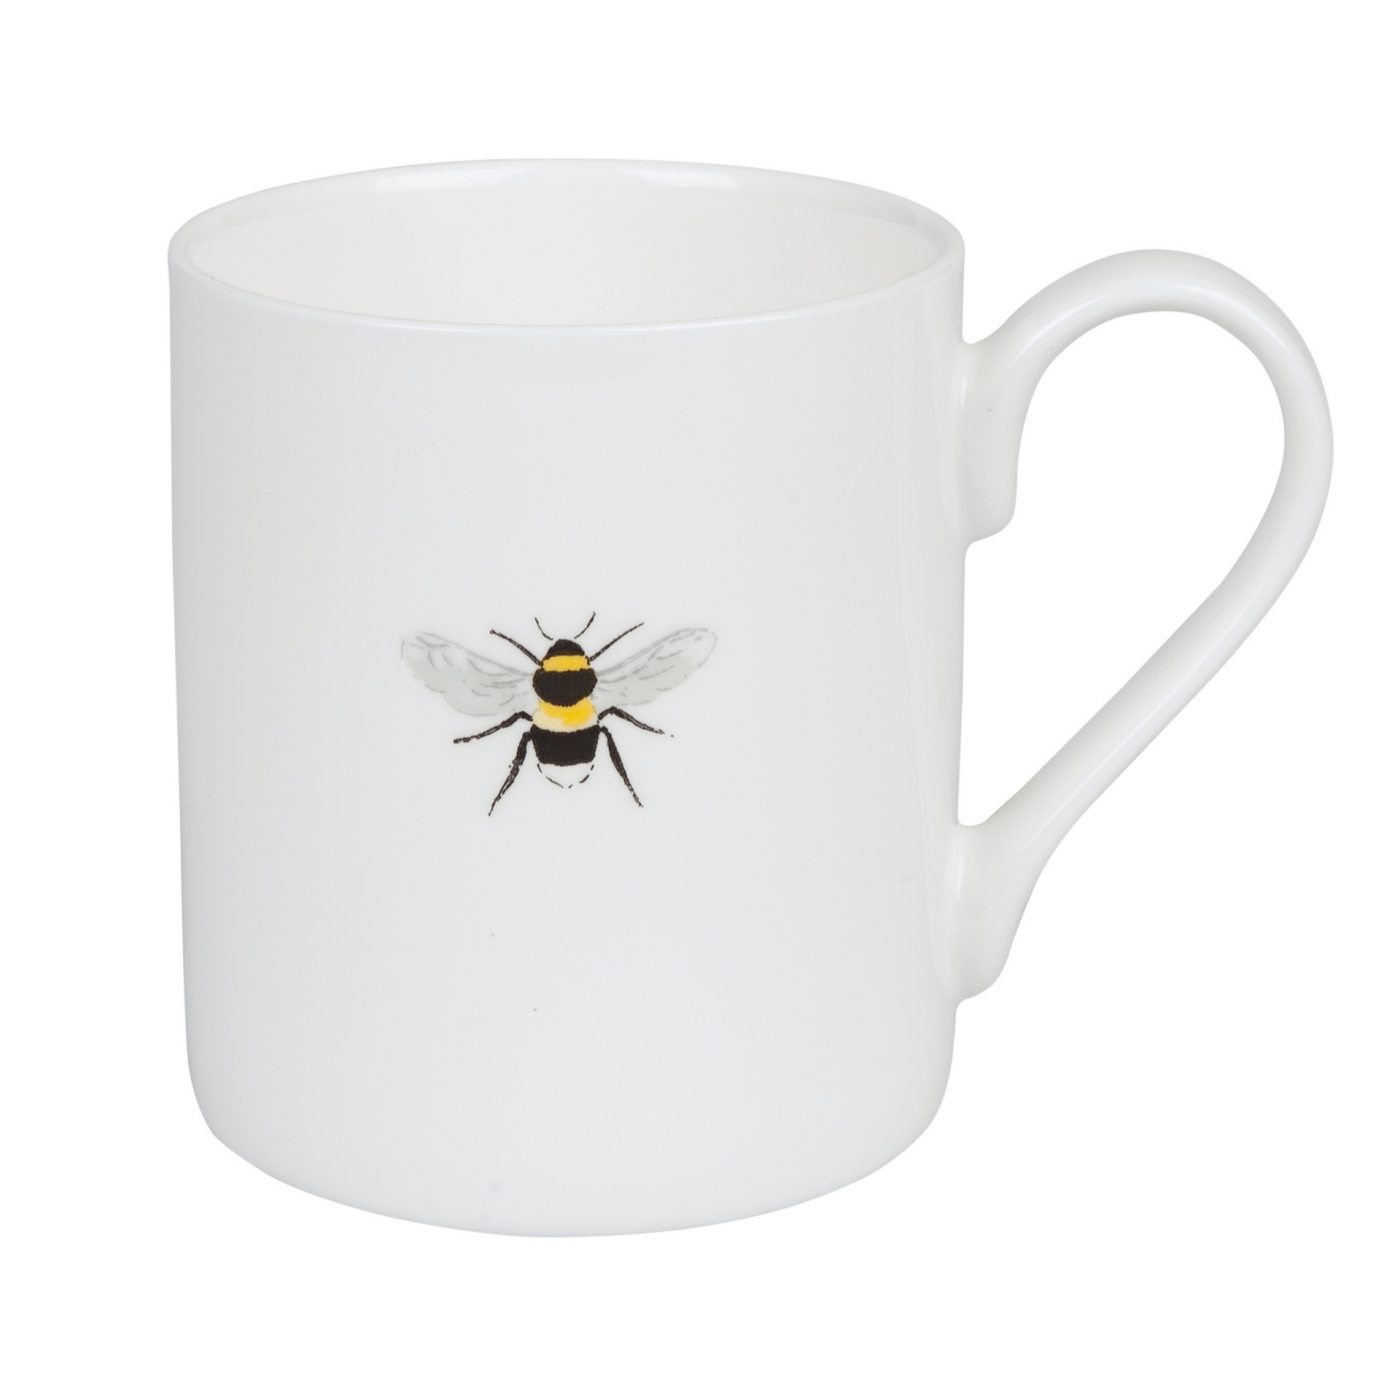 sophie allport solo bee mug